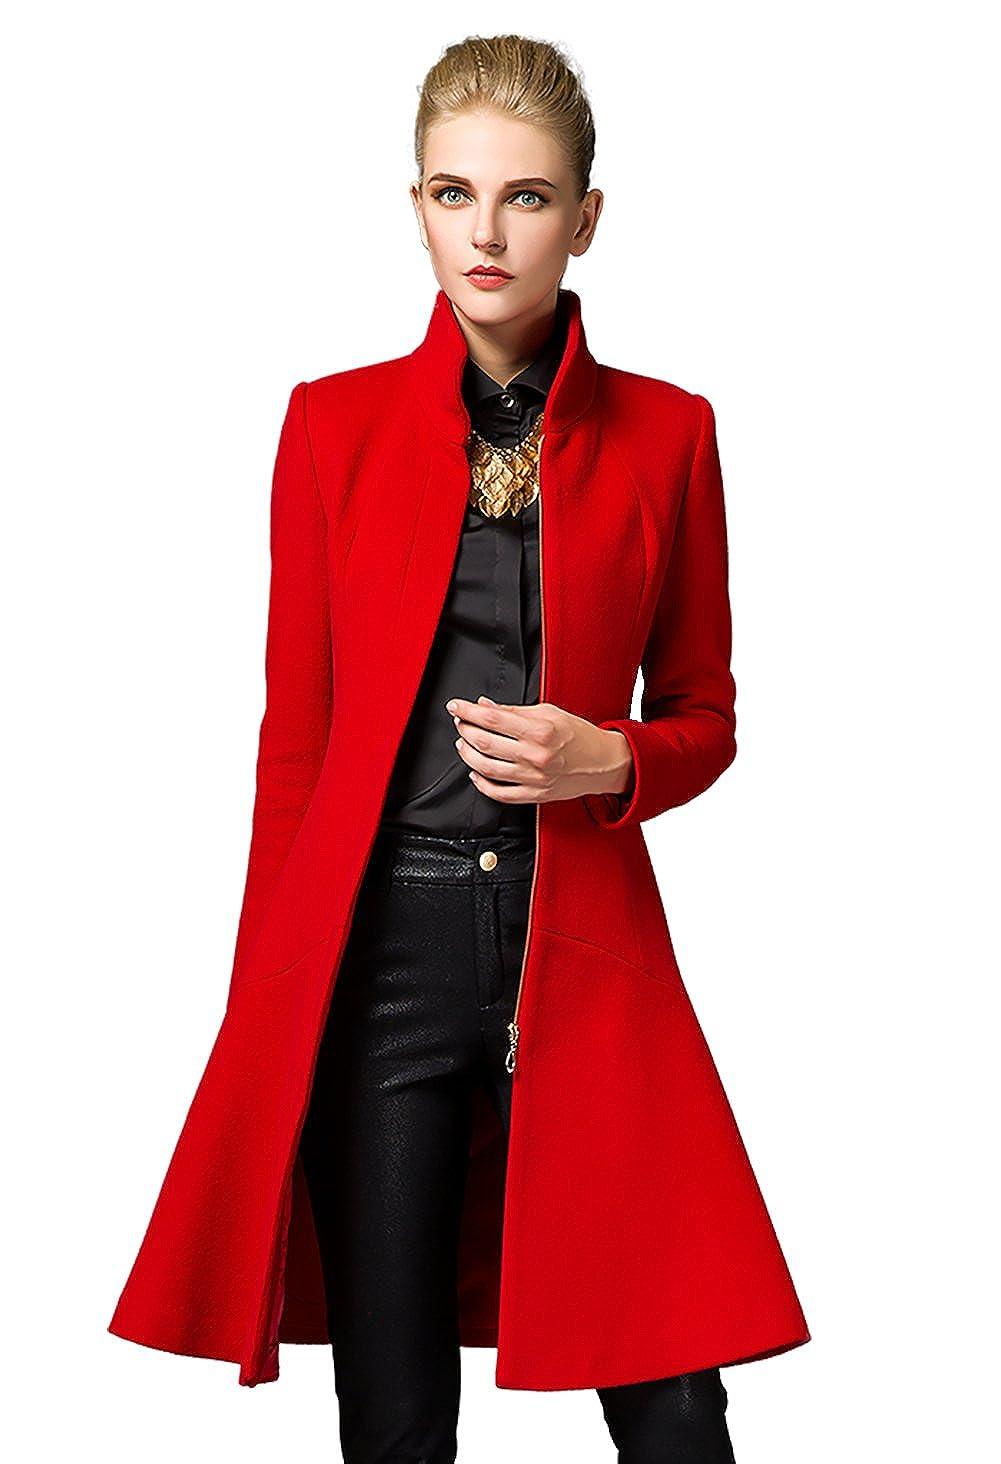 Amazon.com: Shmily Girl Womens Winter Slim Collar Mid-Length Woolen Coat Jacket Overcoat: Clothing